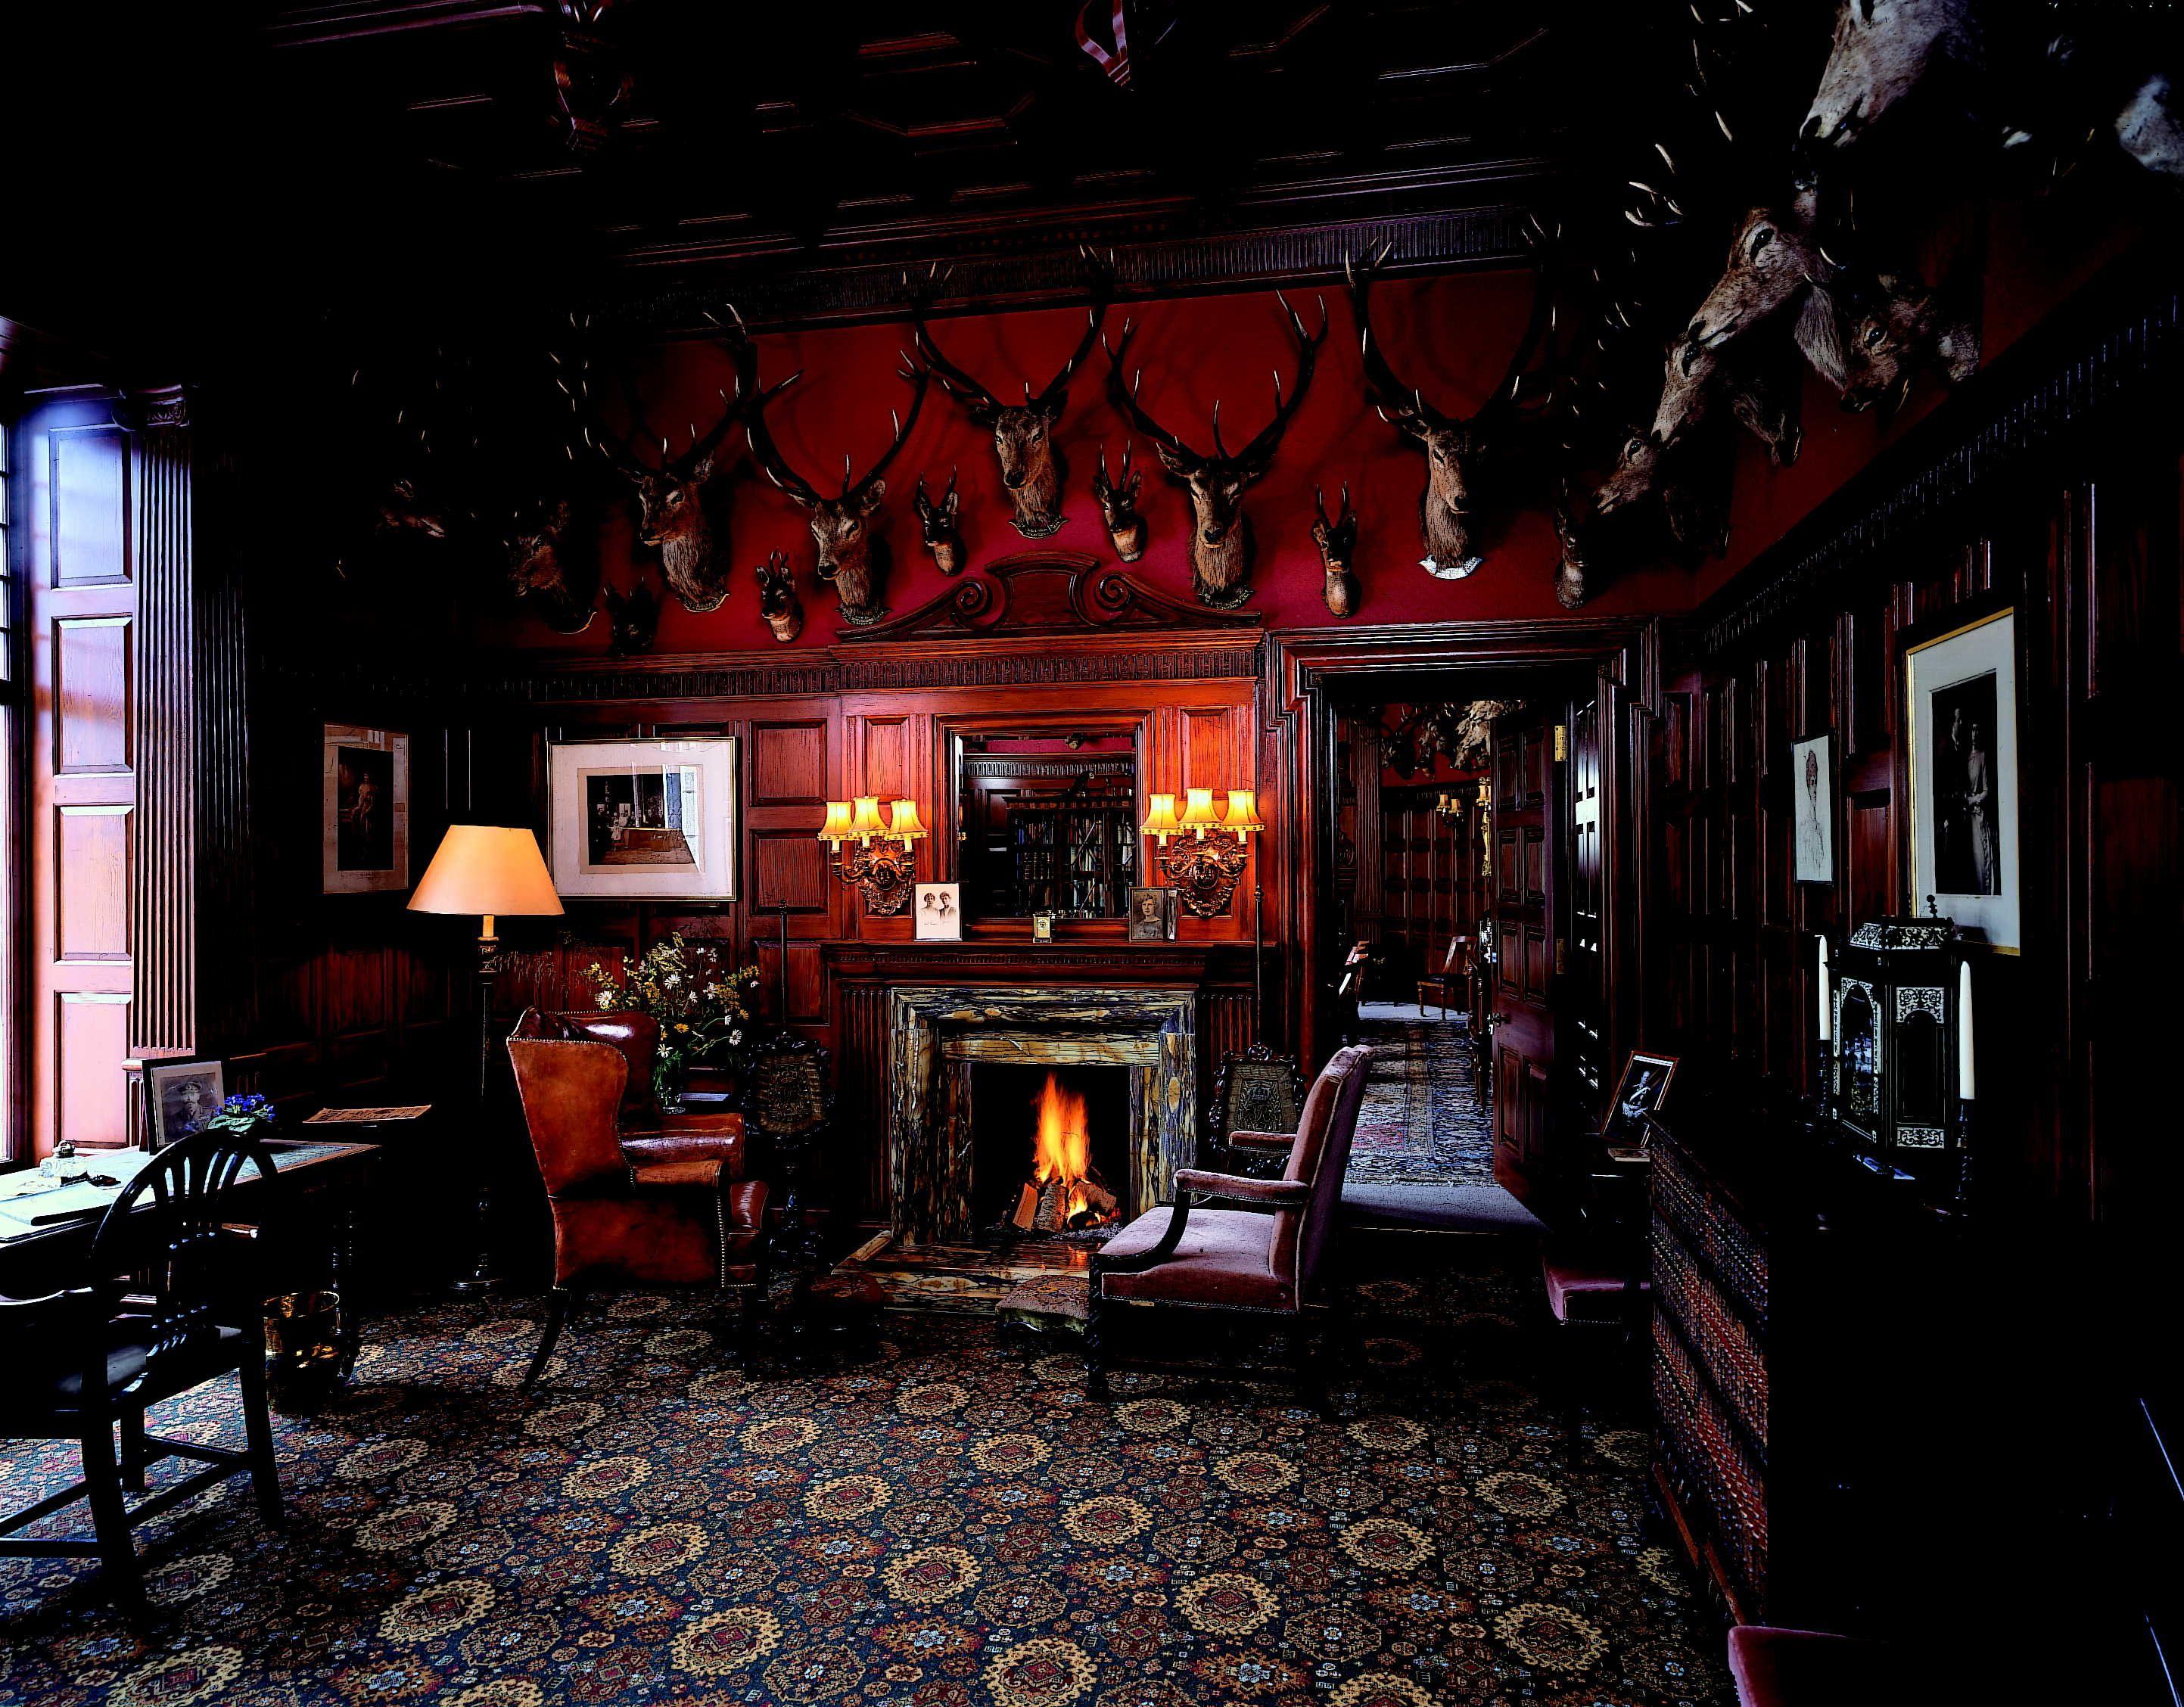 scottish castles interiors fivie castle | living rooms! sitting